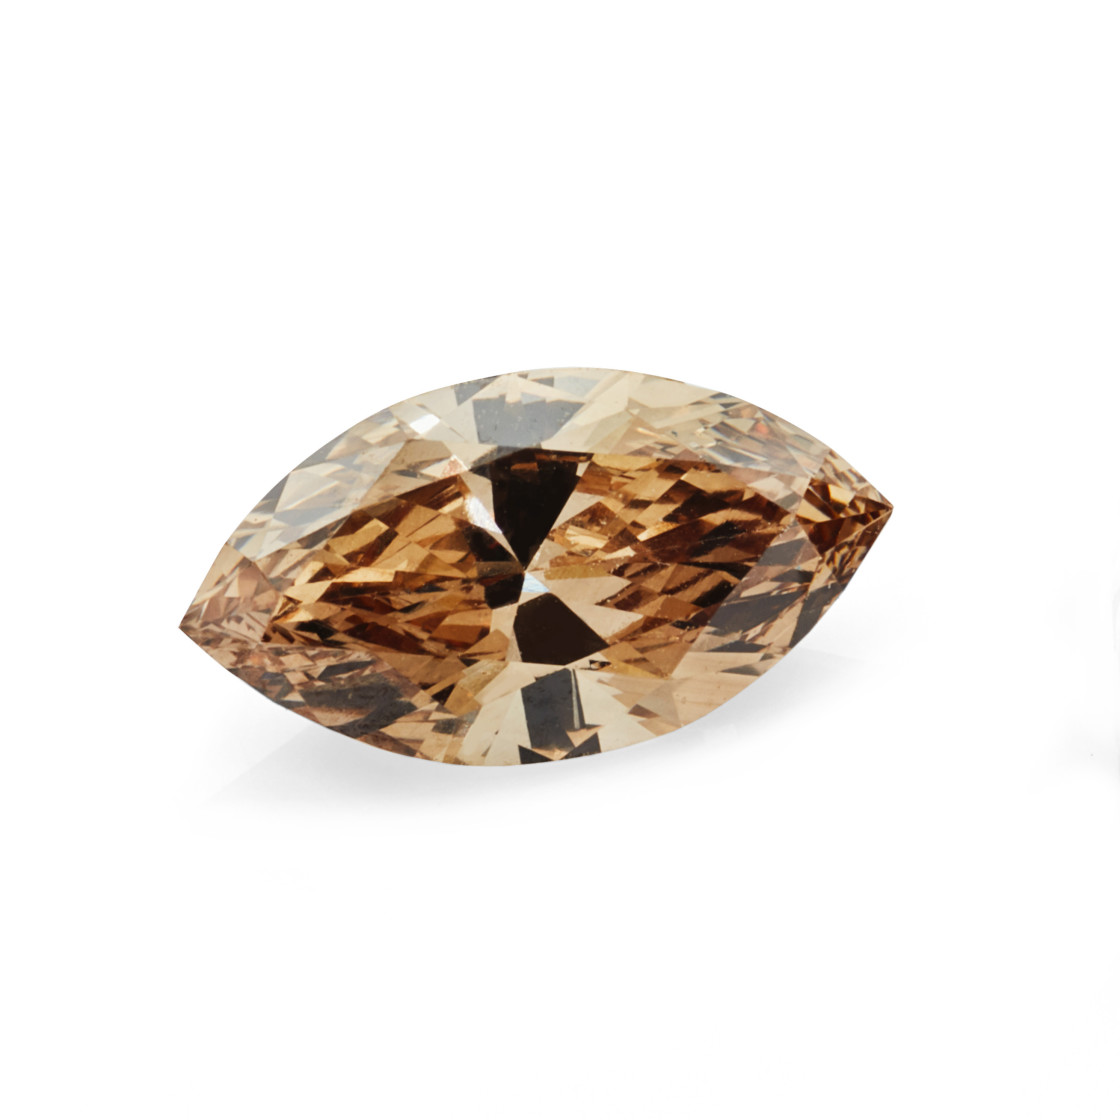 """0.88 carat brown marquise cut diamond"" stock image"